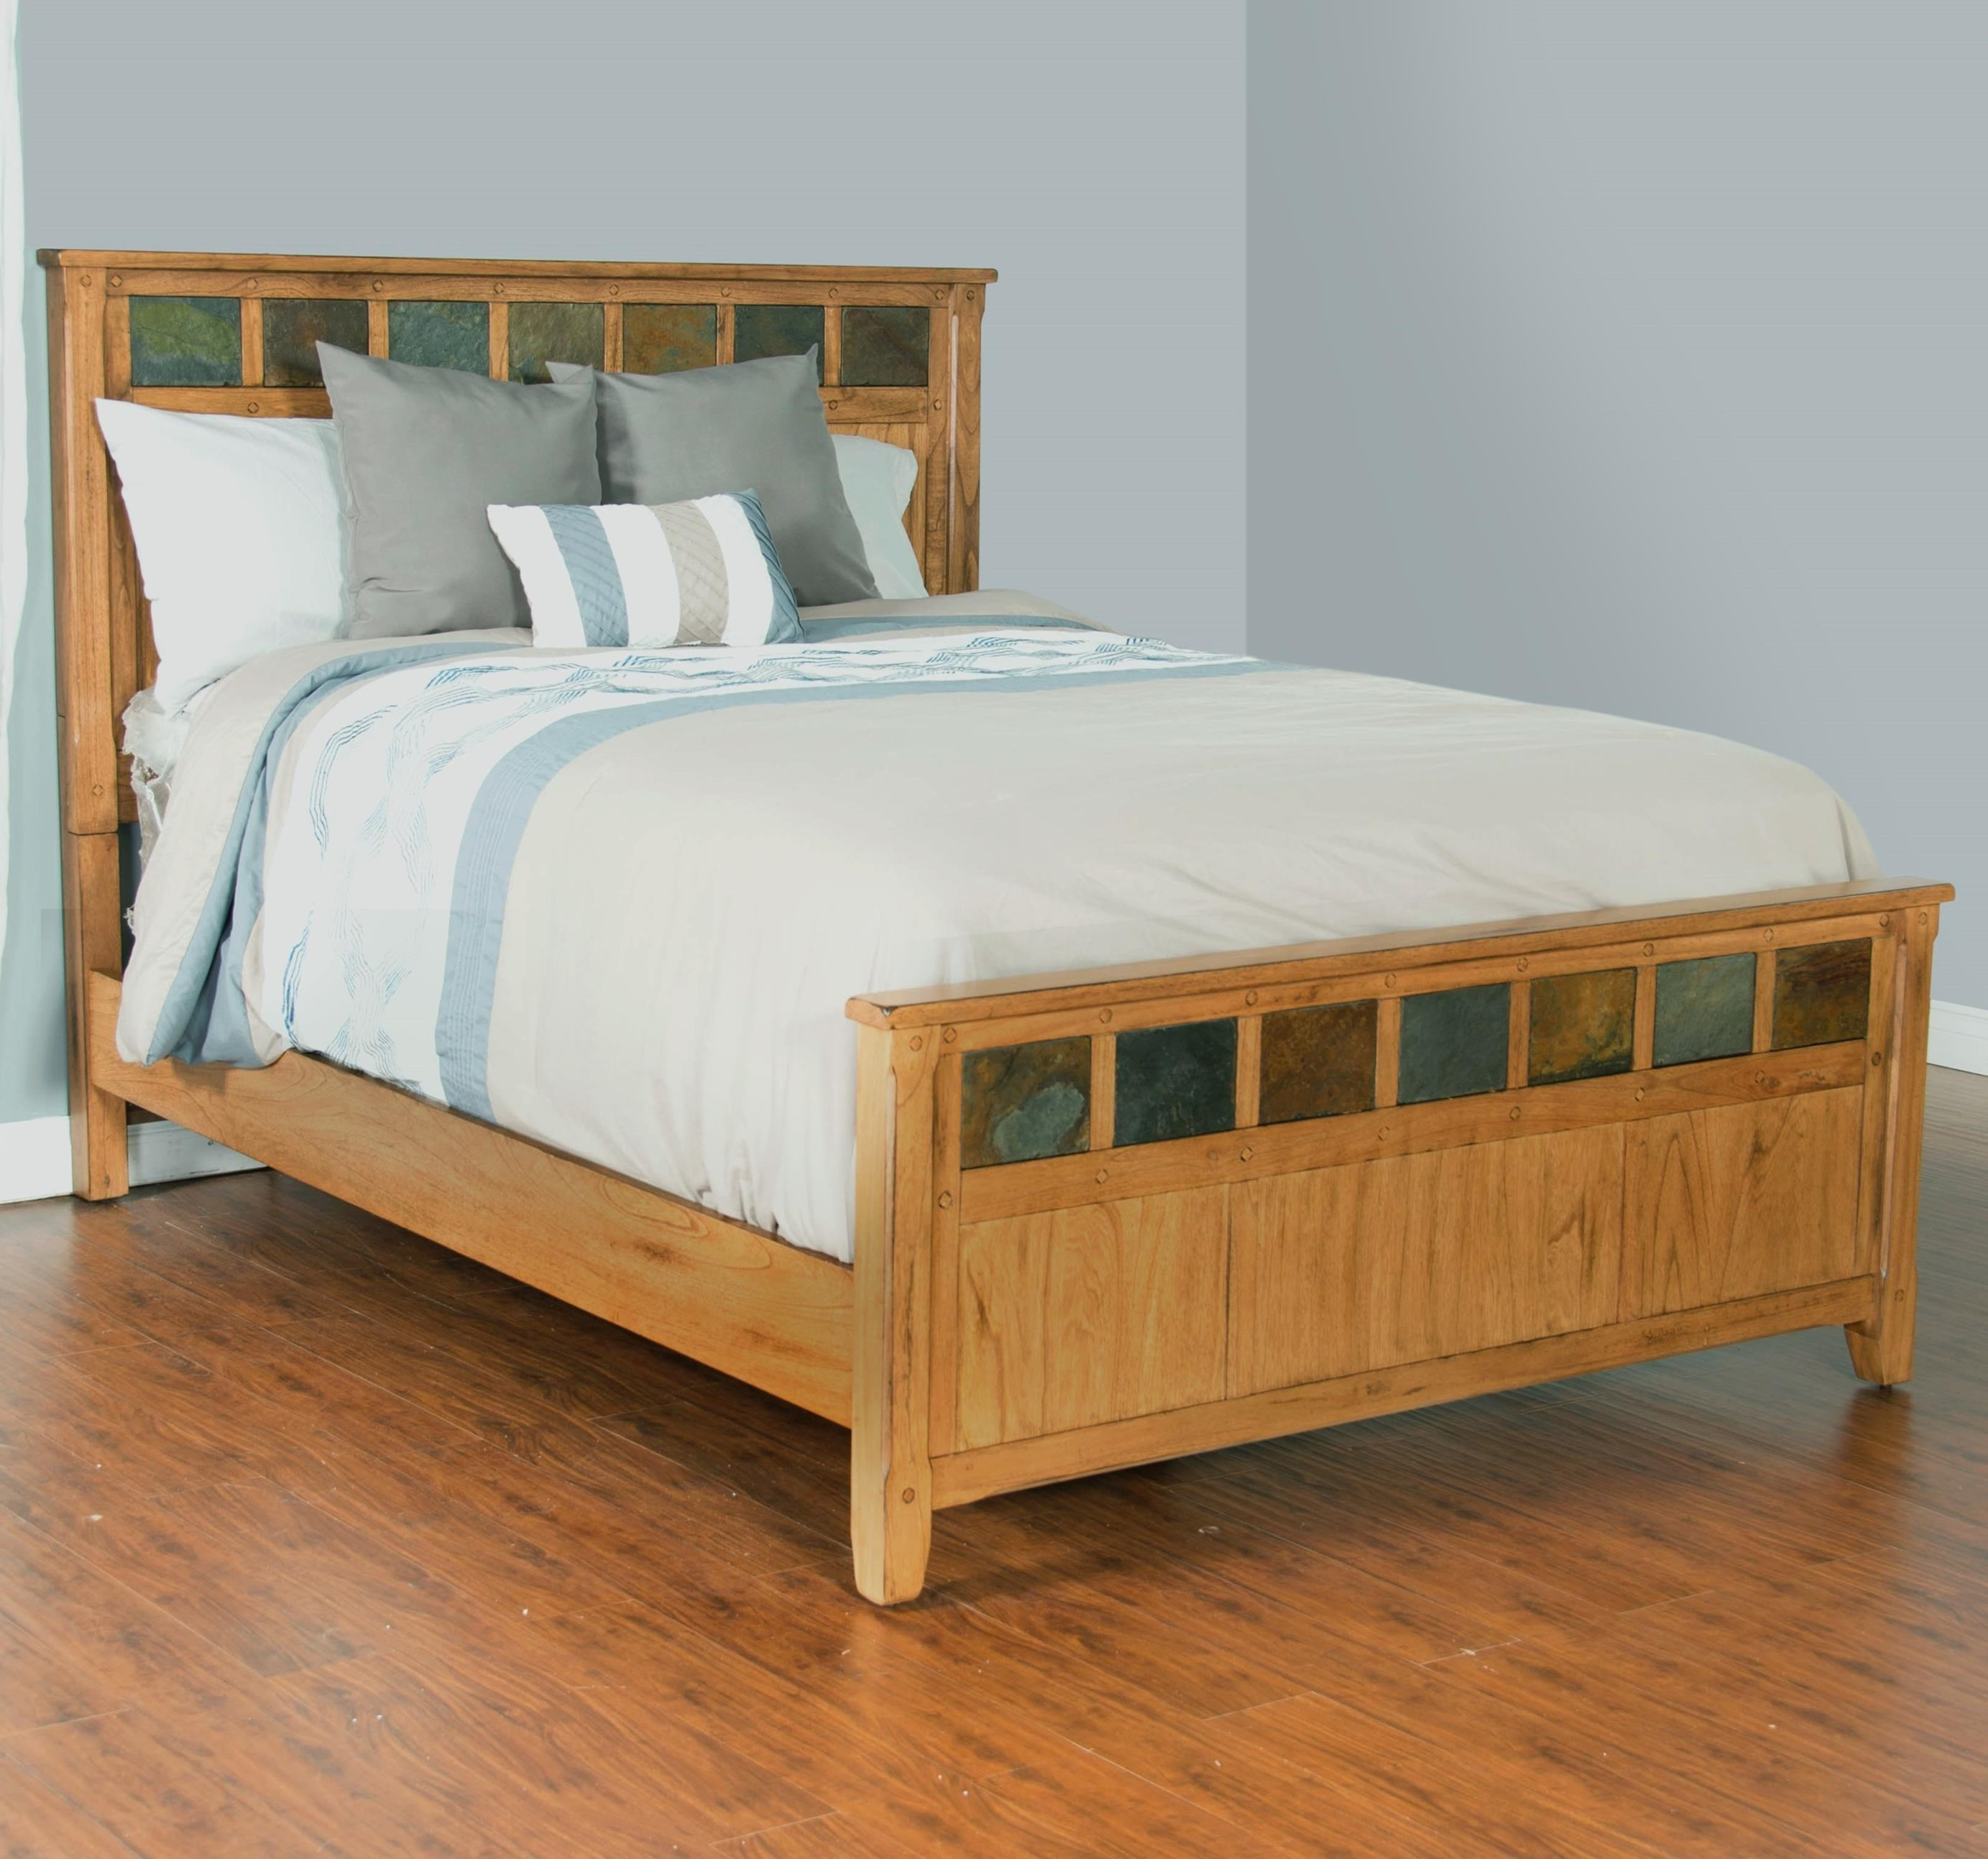 Sunny Designs Sedona Queen Bed with Slate Tiles | Suburban ...